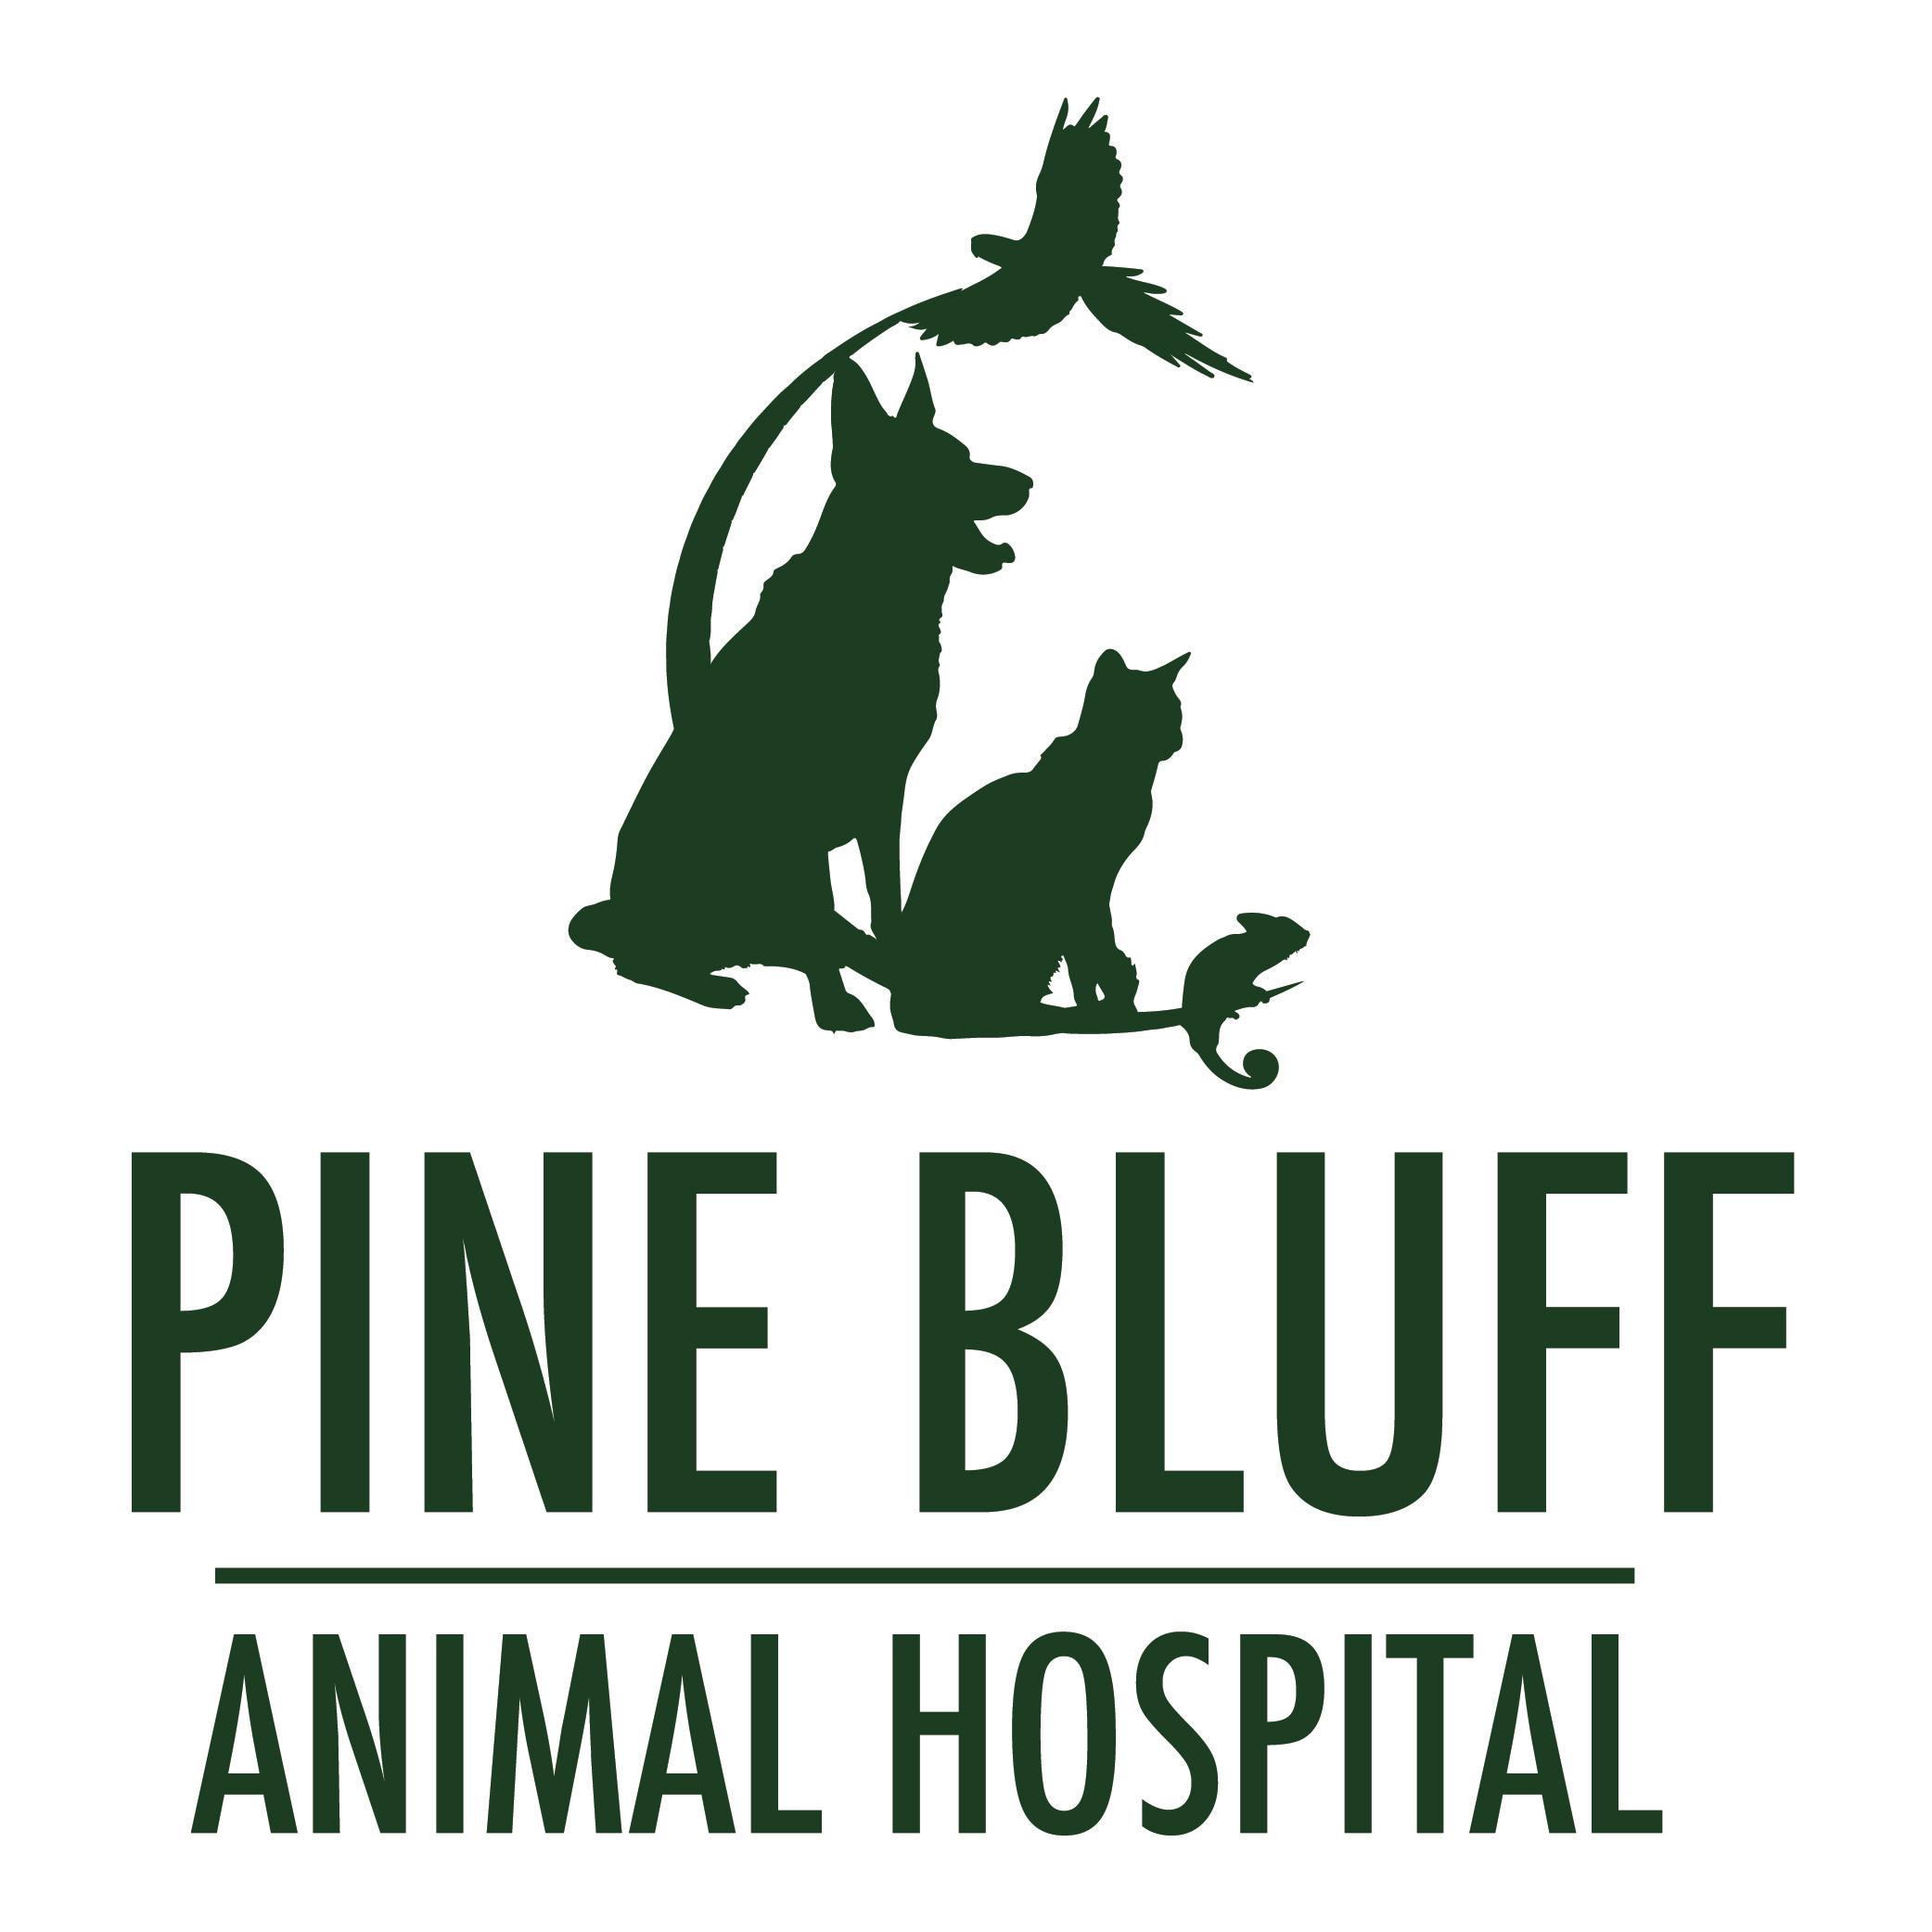 pine bluff animal hospital in morris il   815 942 5